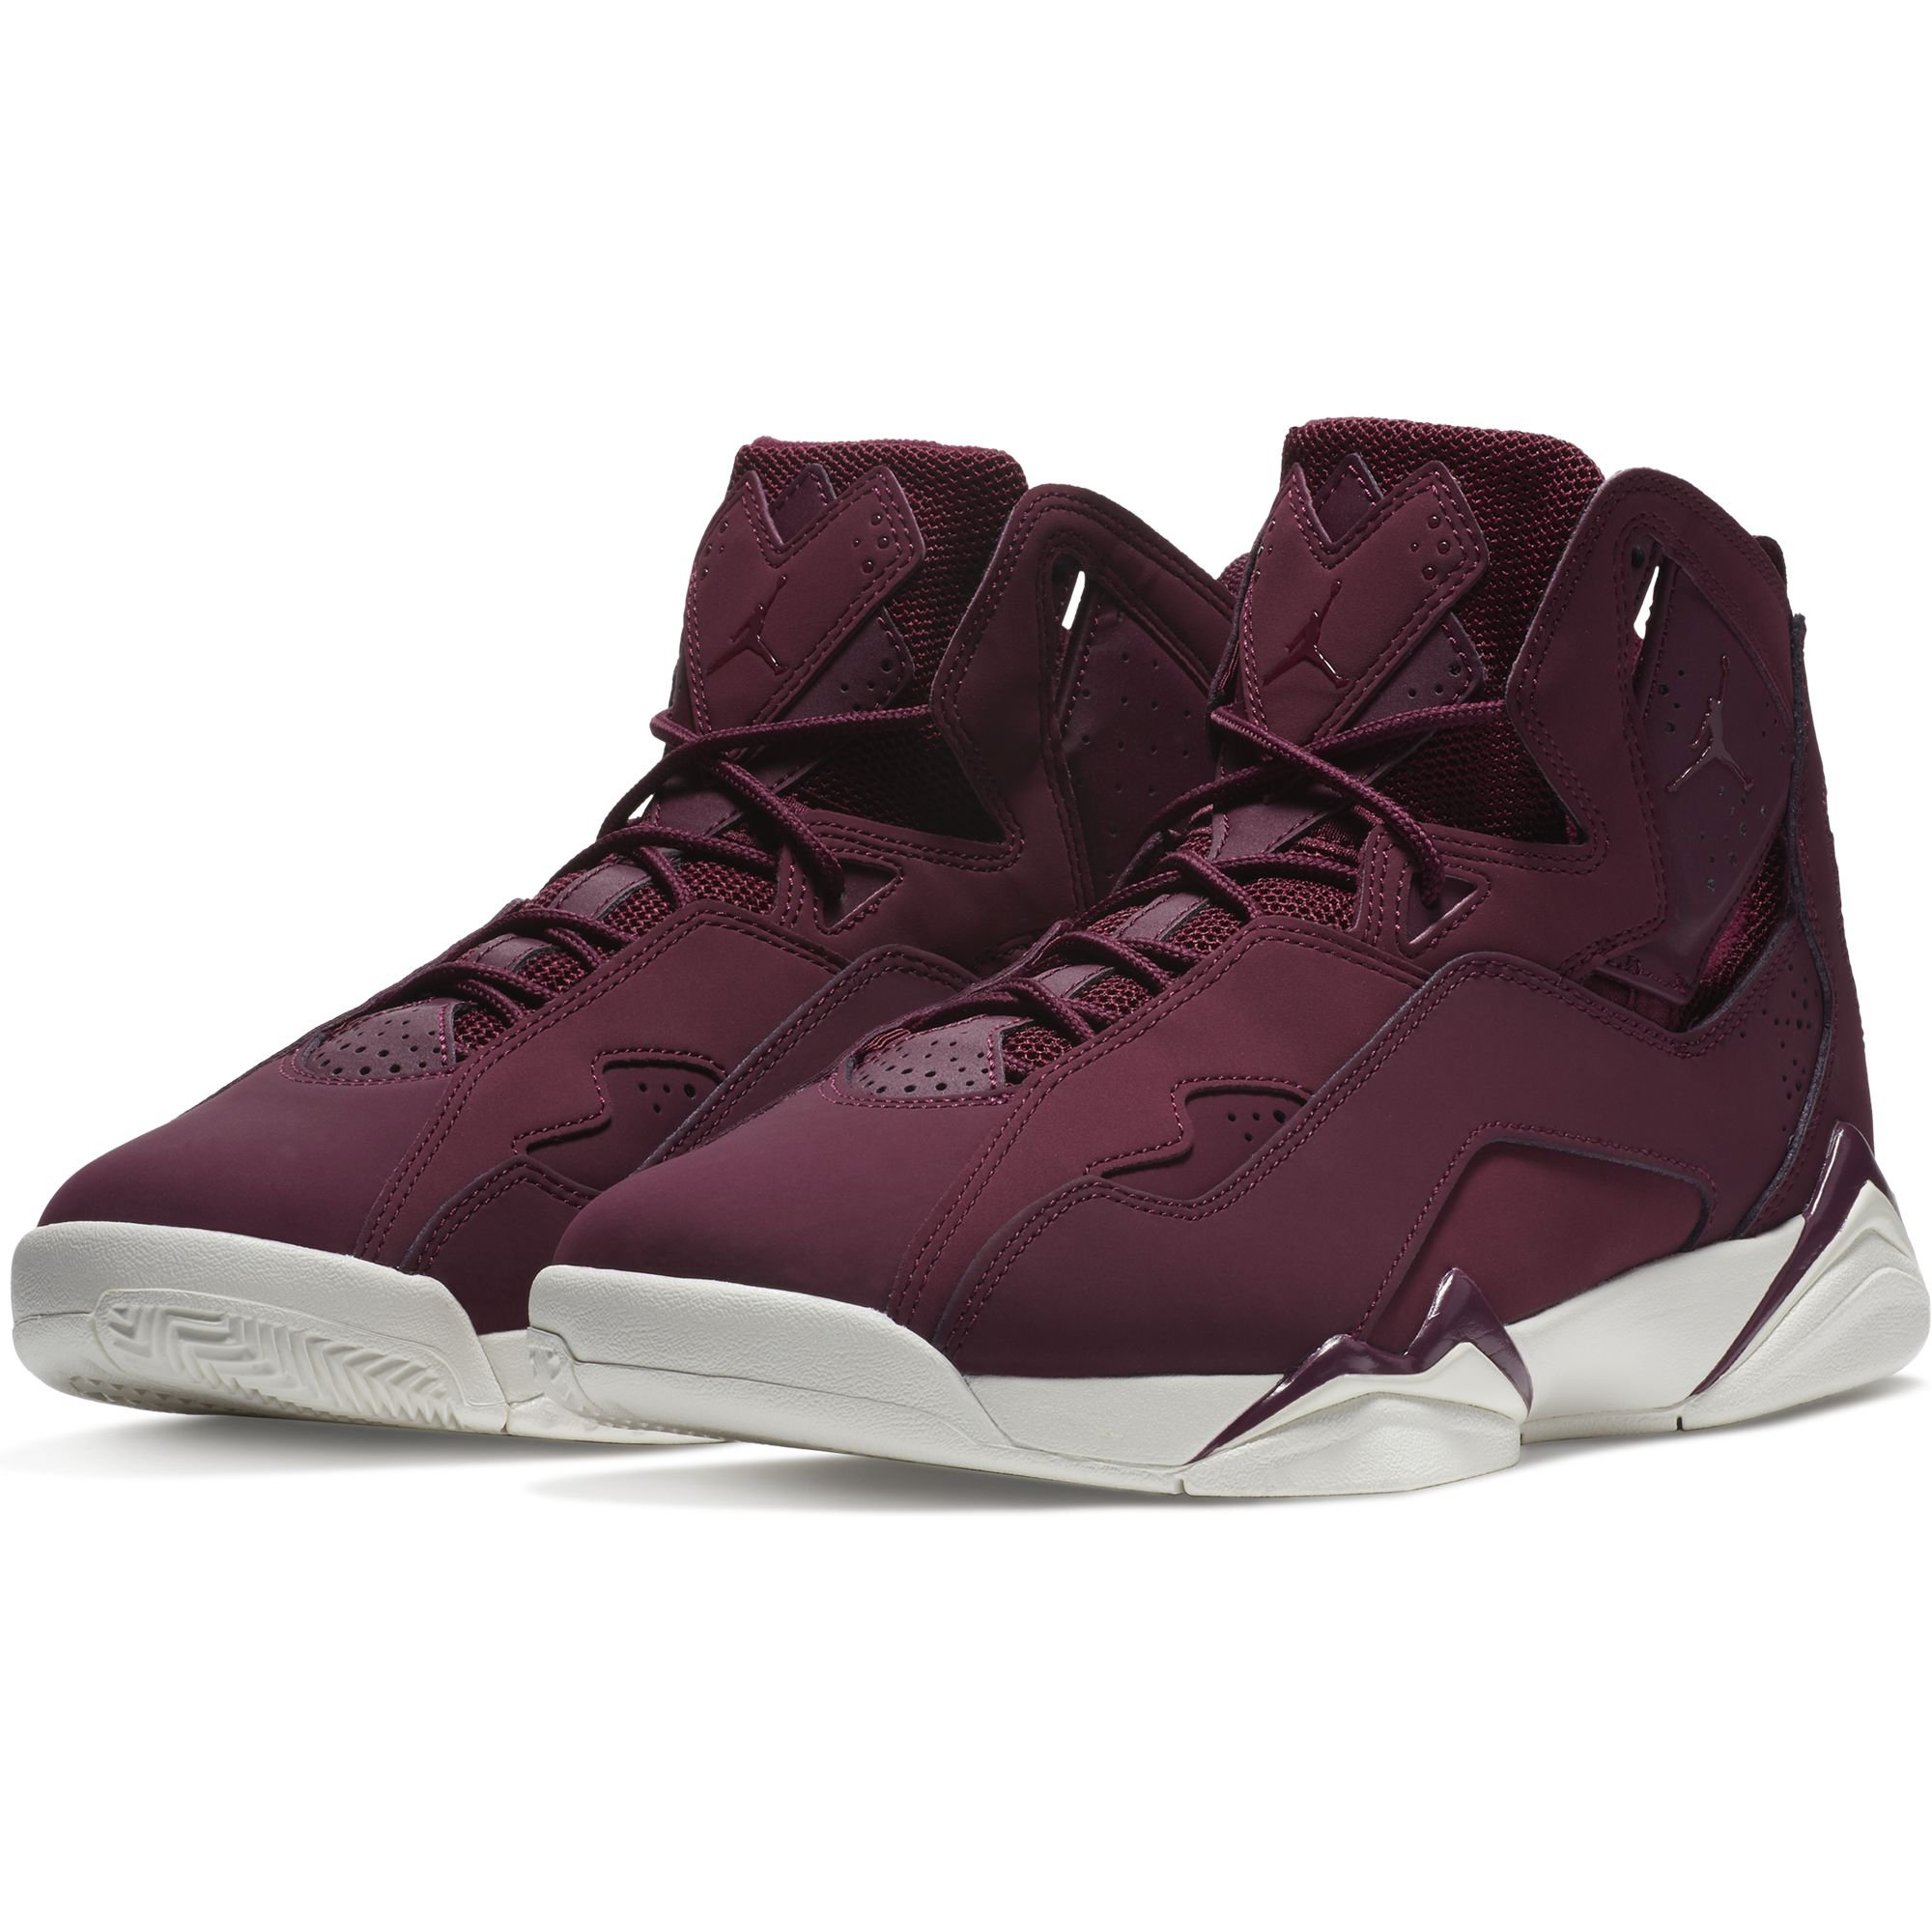 Men's Jordan True Flight Basketball Shoe, Bordeaux/Bordeaux-Sail 7.5 by Jordan